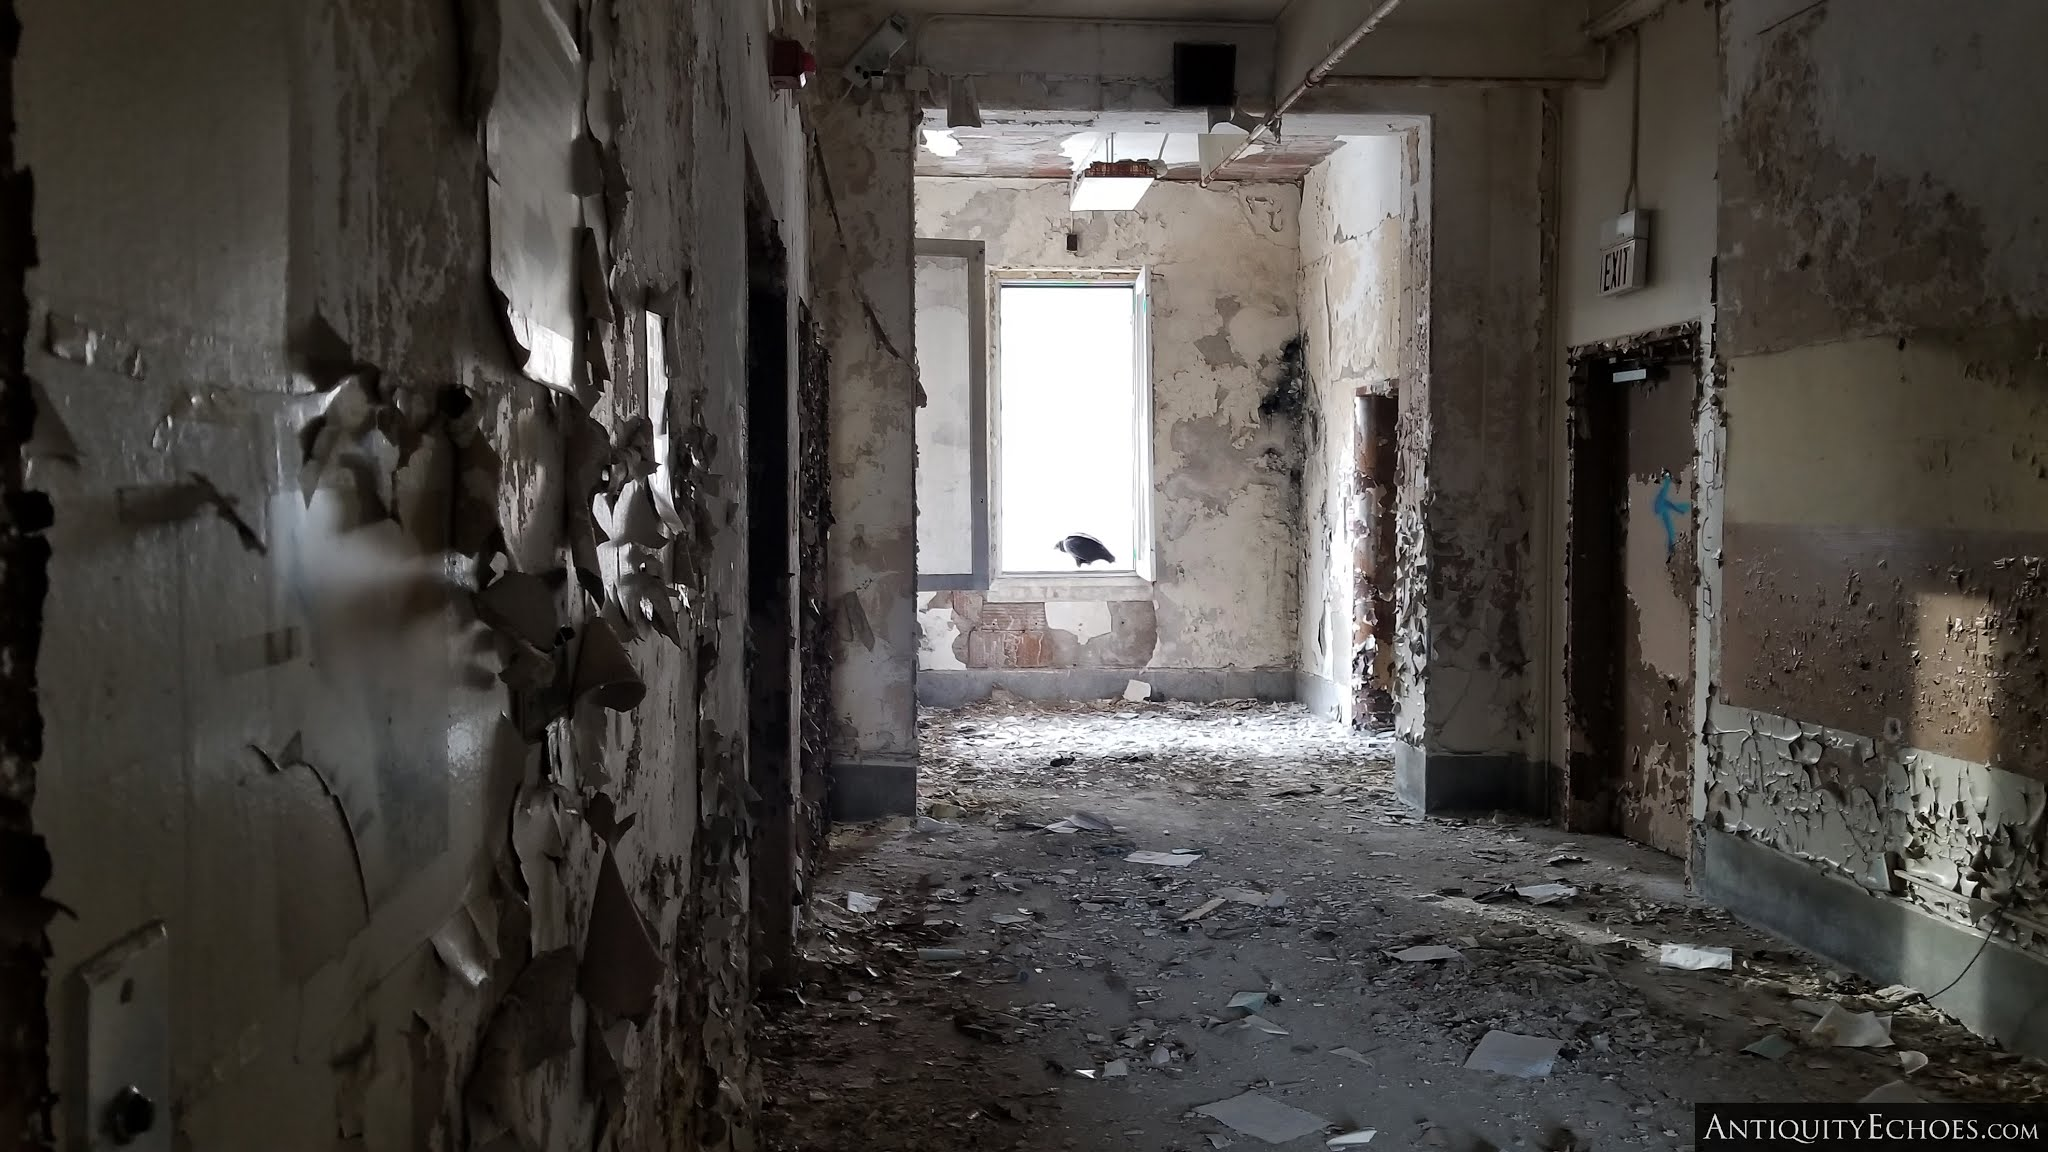 Overbrook Asylum - A Vulture Perches in a Windowless Frame